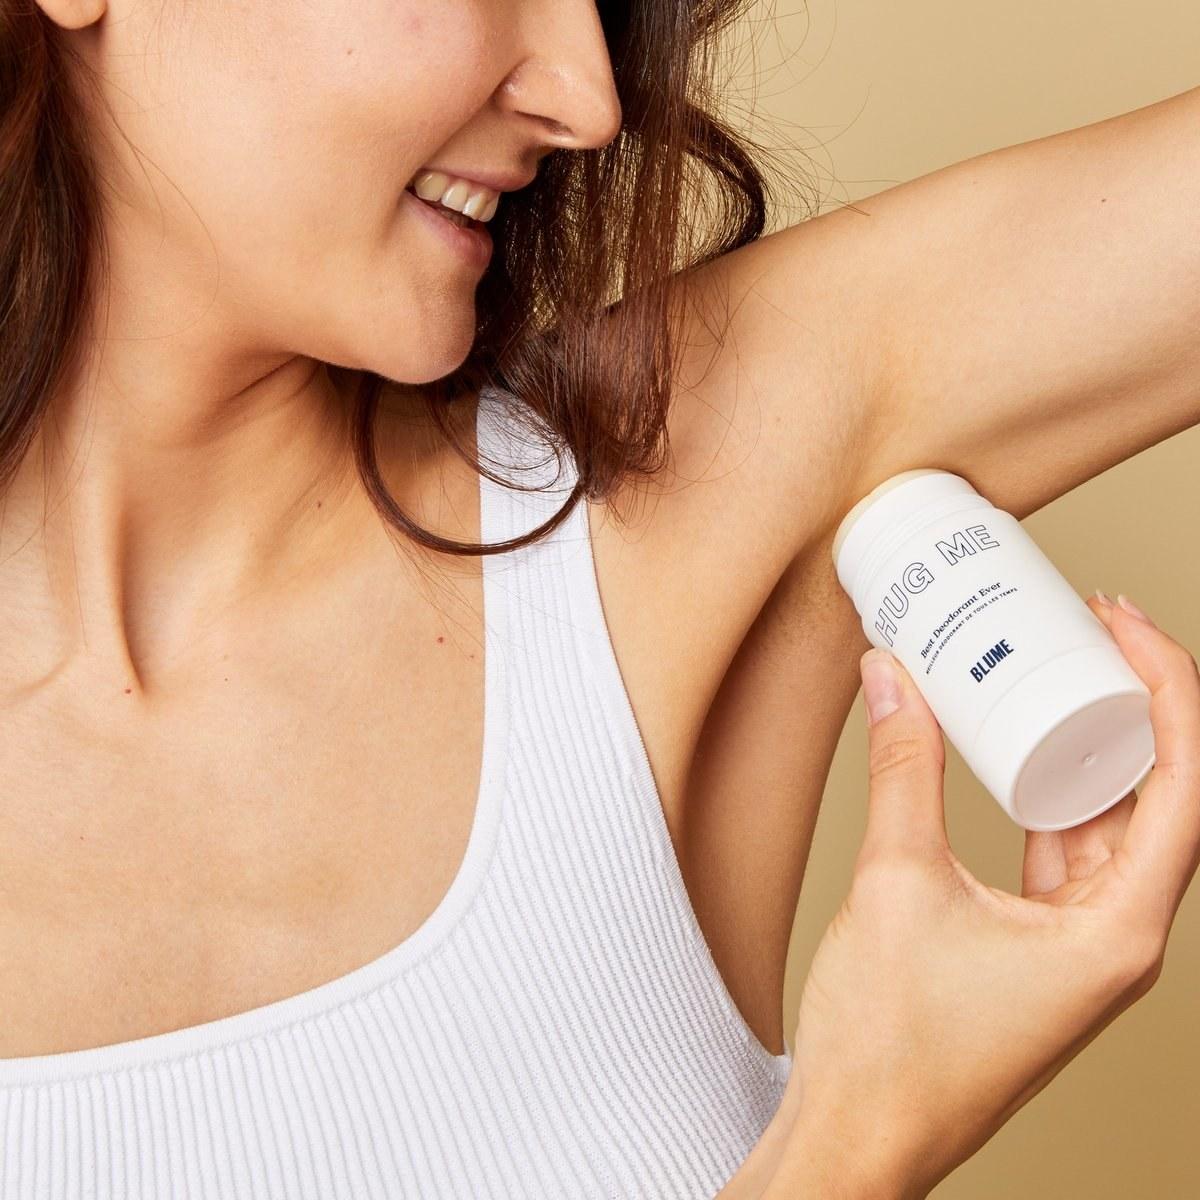 person applying the deodorant